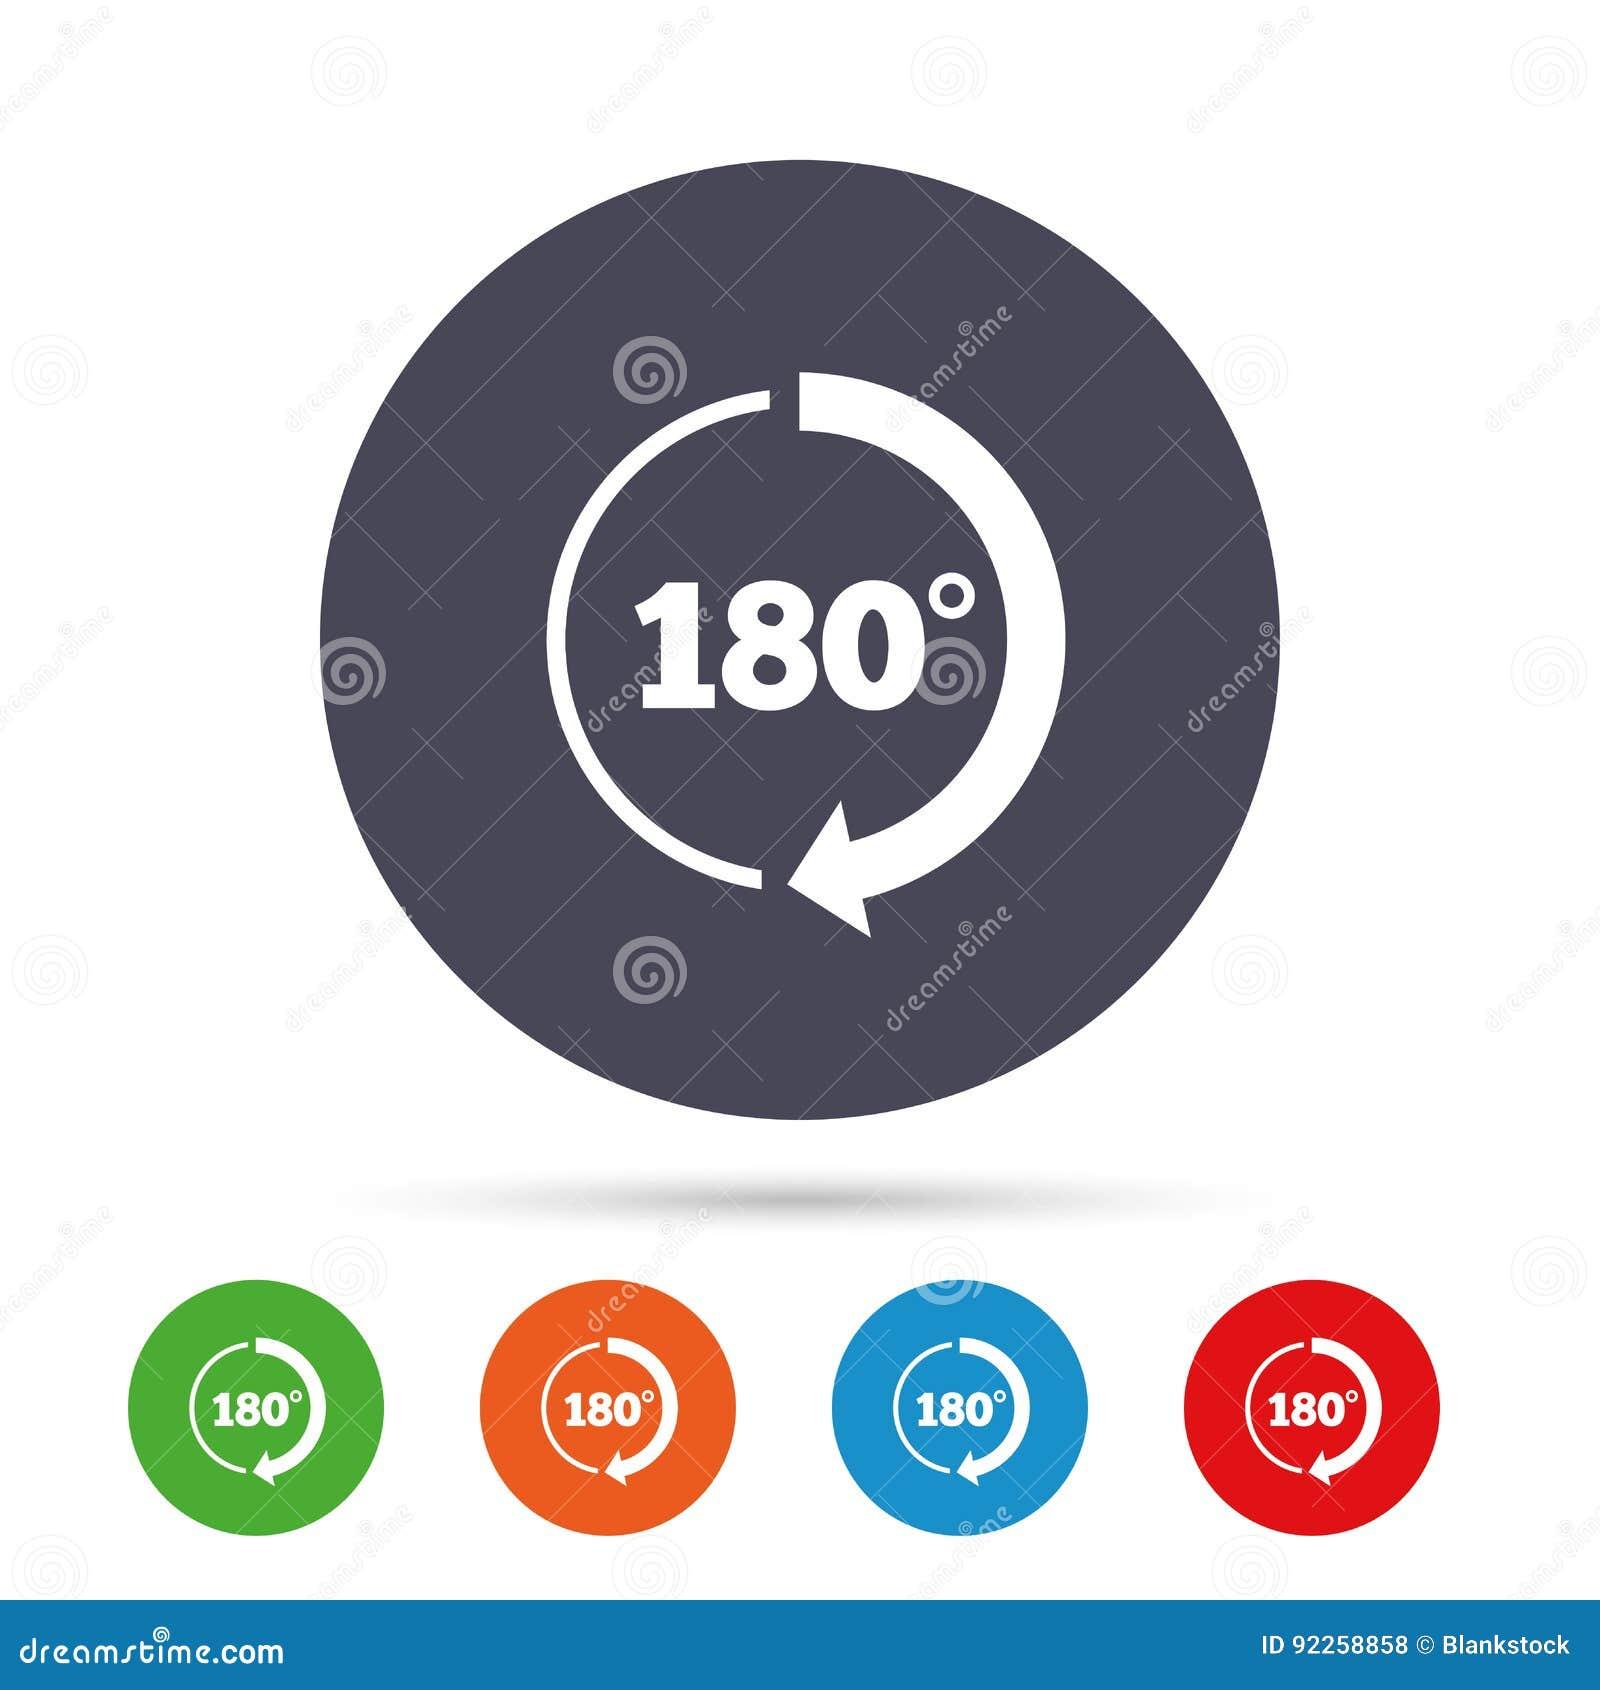 Winkel 180 Grad Zeichenikone Geometriemathesymbol